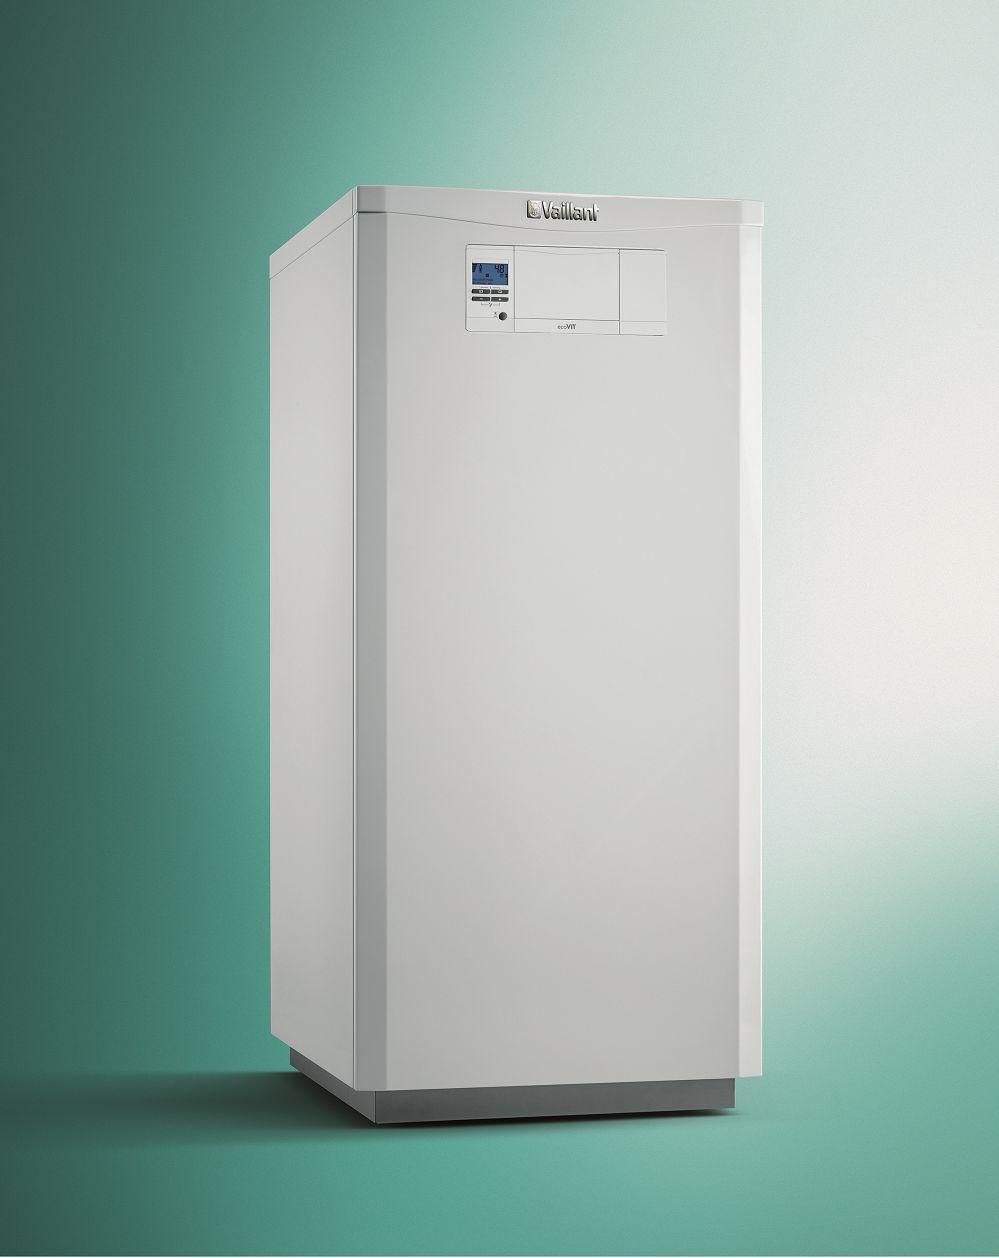 Caldaie a basamento a condensazione rci riscaldamento for Caldaie vaillant modelli vecchi